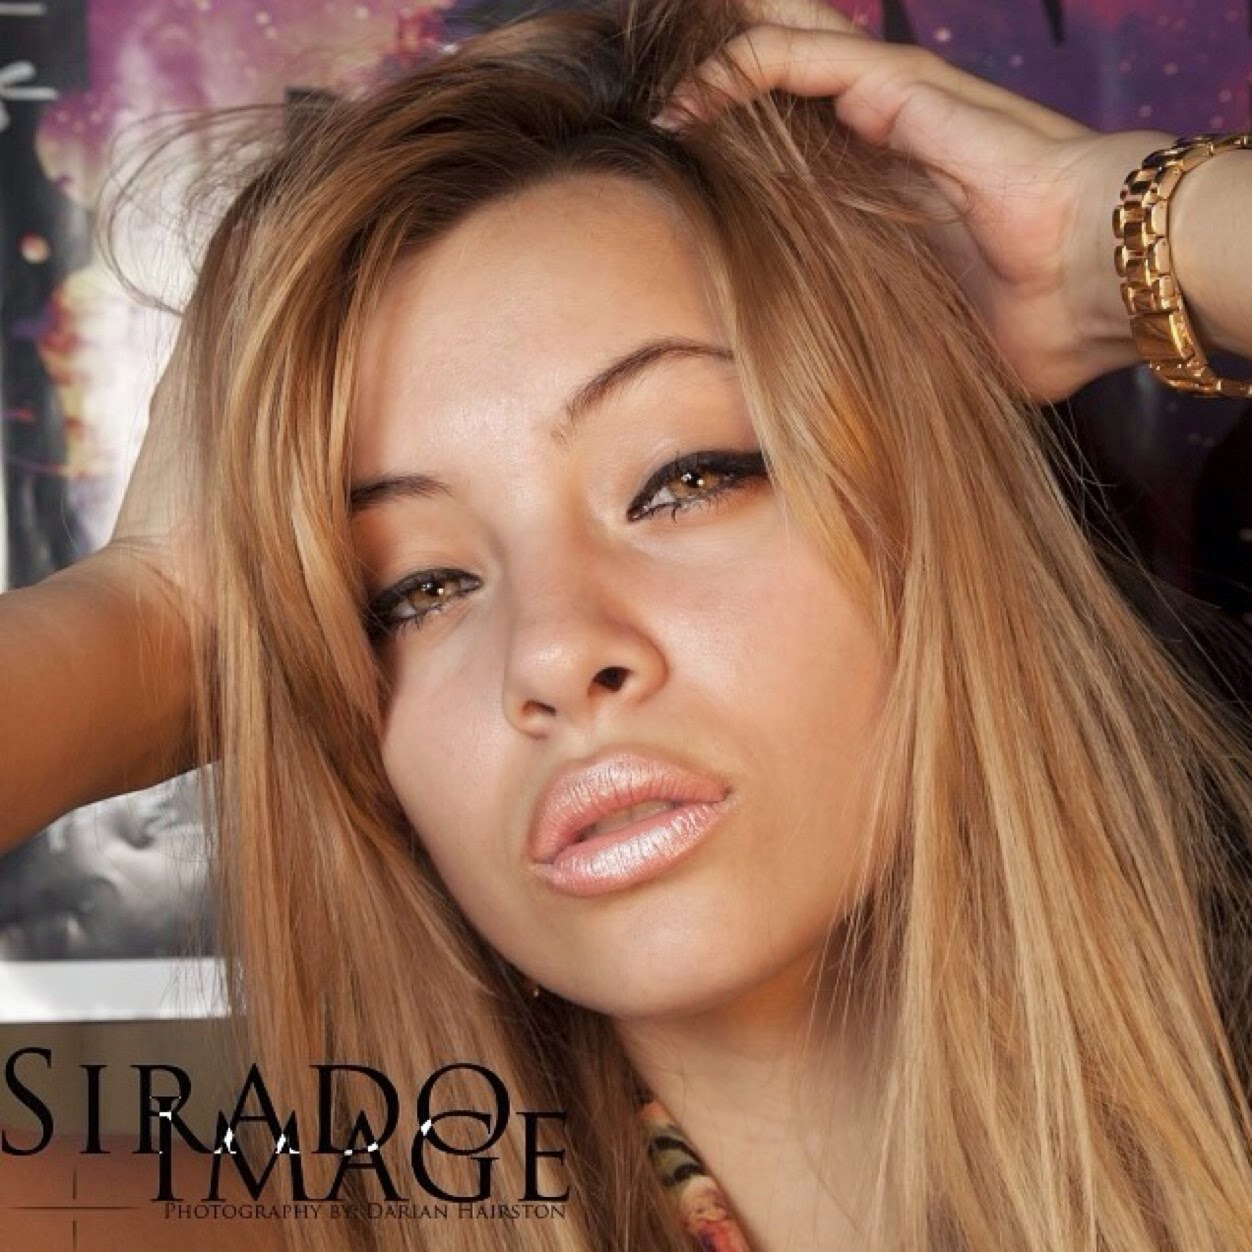 Mirjana americas next top model myideasbedroom com